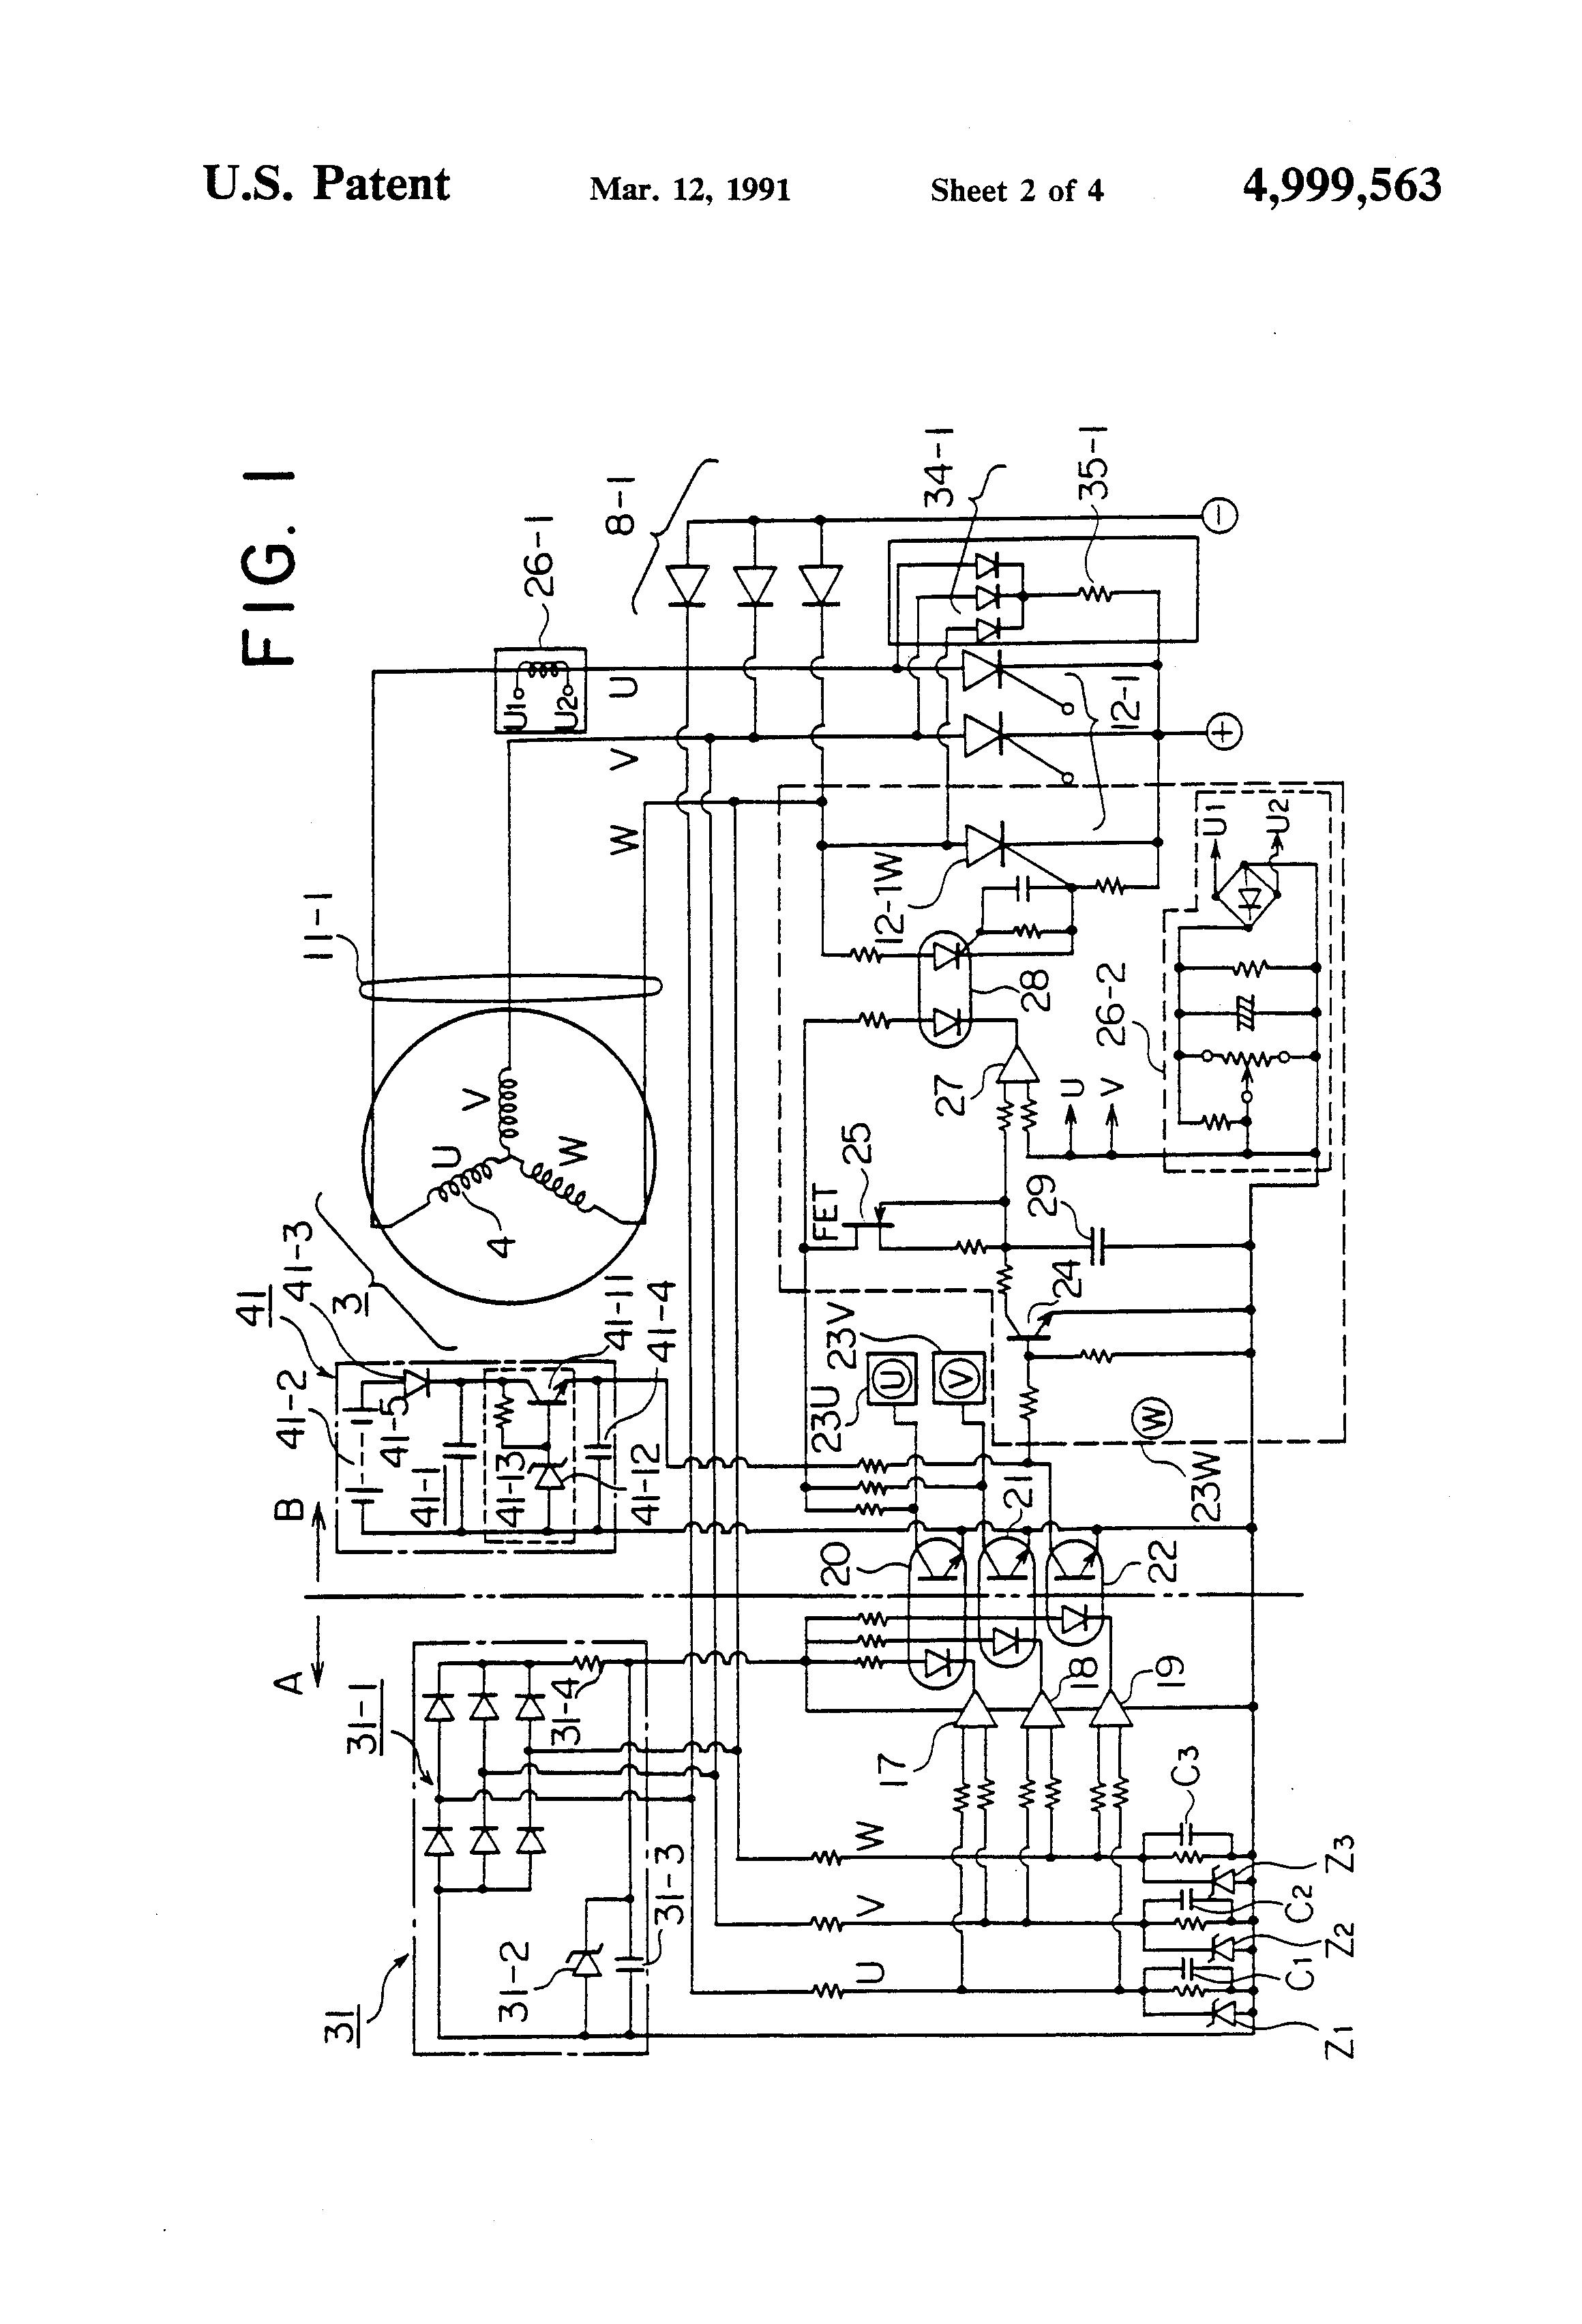 [SCHEMATICS_4HG]  Welding Generator Schematic Diagram -Toyota Camry Electrical Wiring Diagram  | Begeboy Wiring Diagram Source | Welding Generator Circuit Diagram |  | Begeboy Wiring Diagram Source